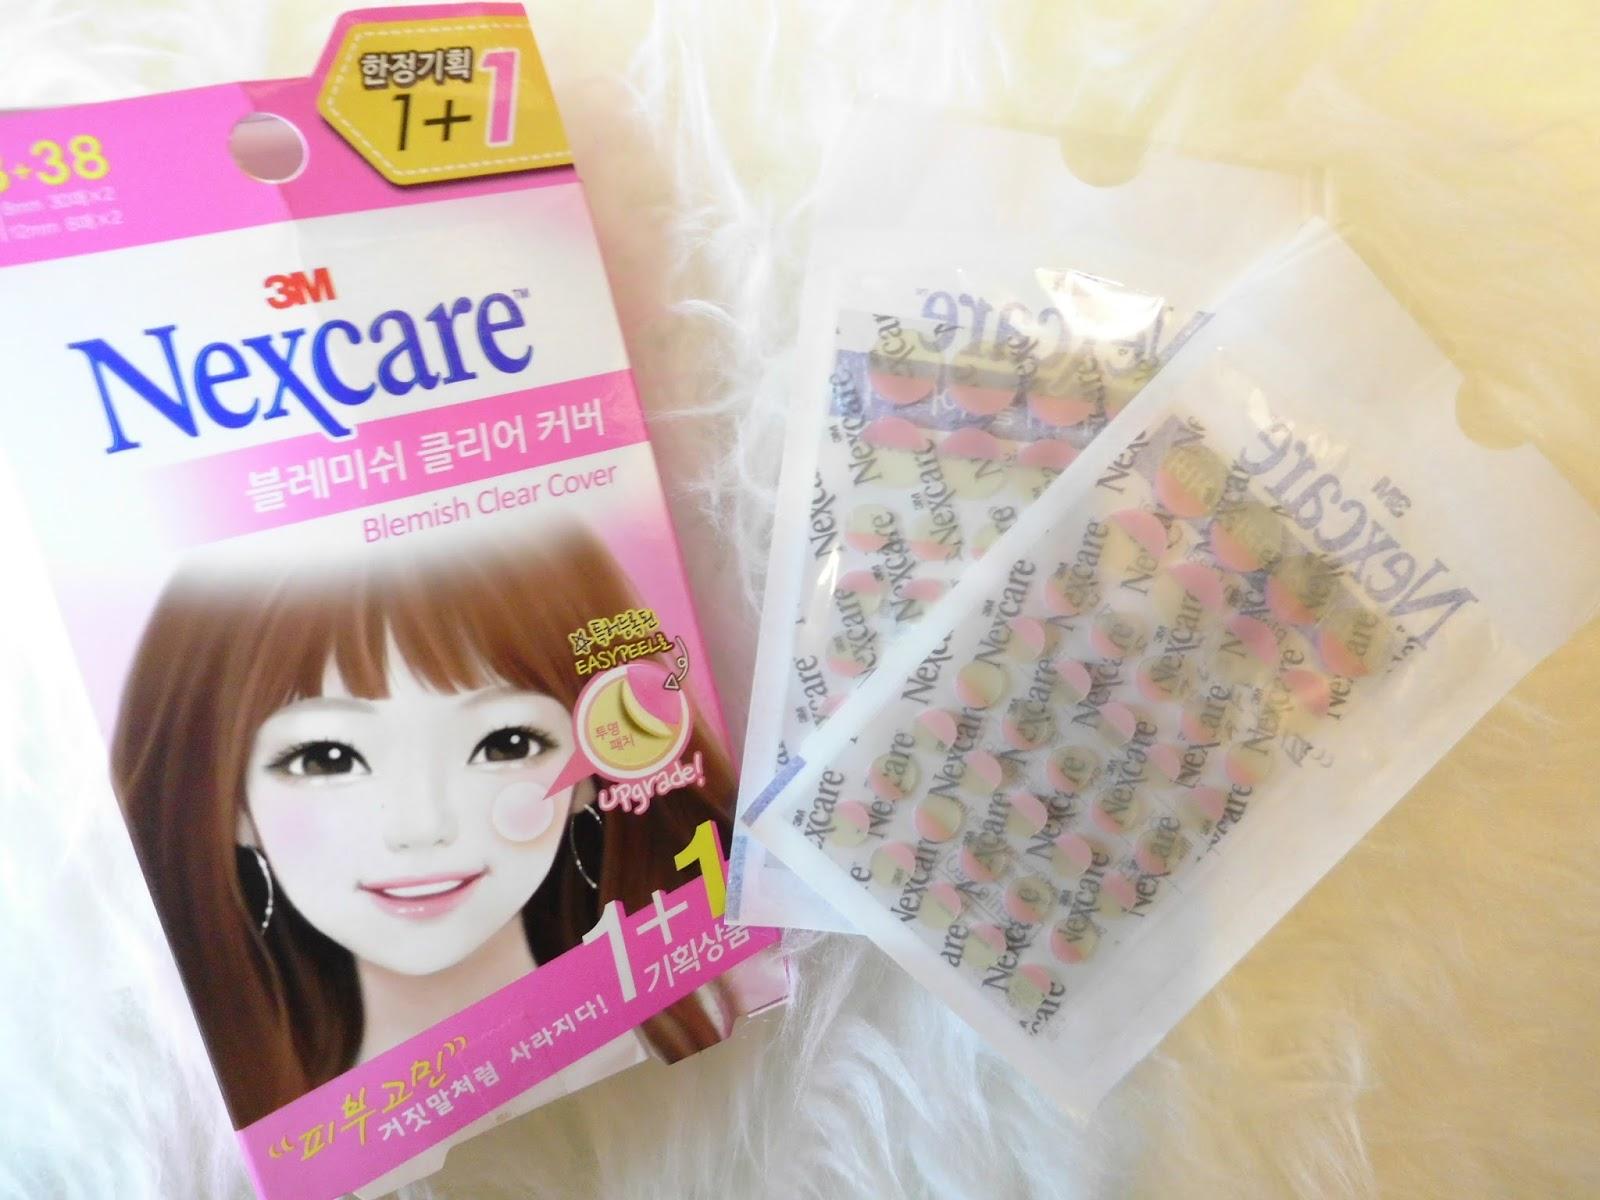 Nicole Lau K. W. Blog: 有膿暗瘡之急救篇 - 3M Nexcare 荳痘隱形貼